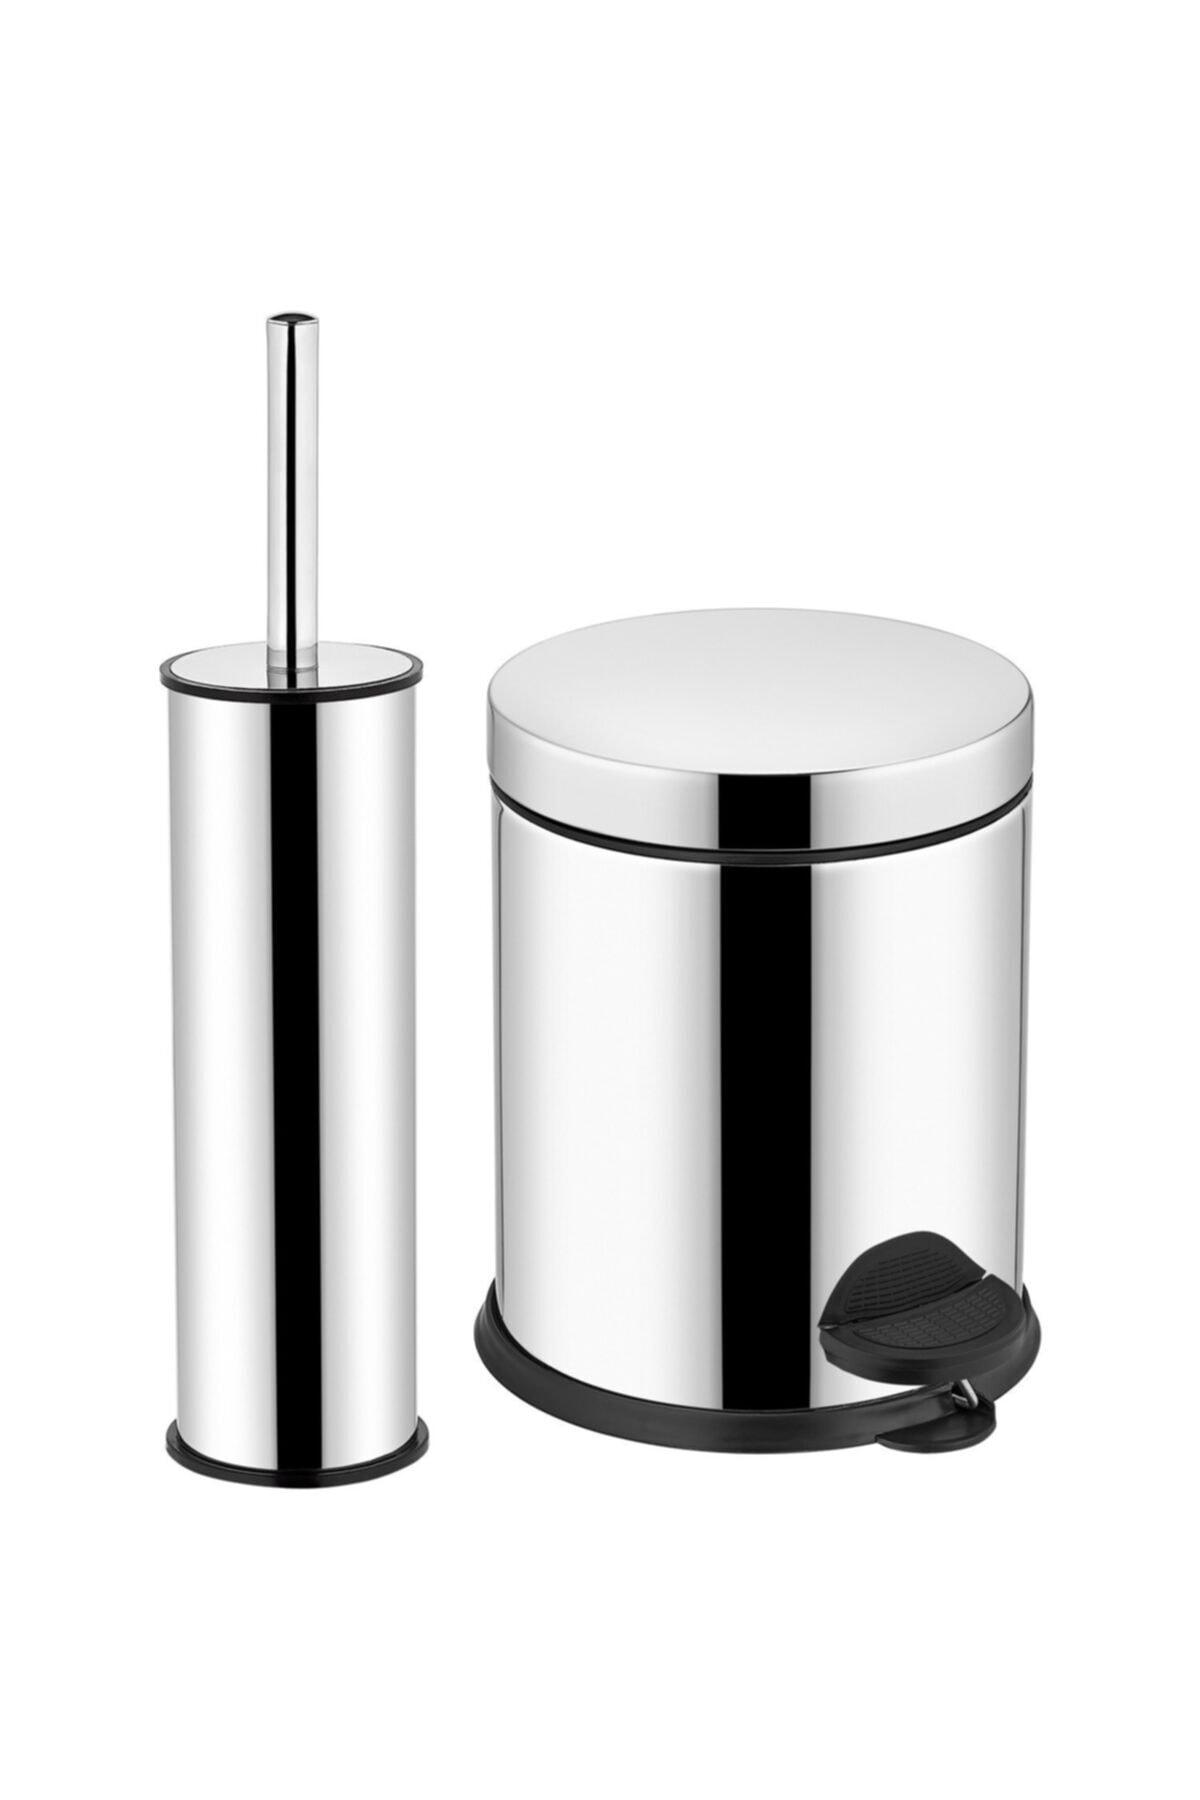 5 Litre Krom 2'li Banyo Seti Pedallı Çöp Kovası Wc Klozet Tuvalet Fırça Seti Banyo Çöp Kovası